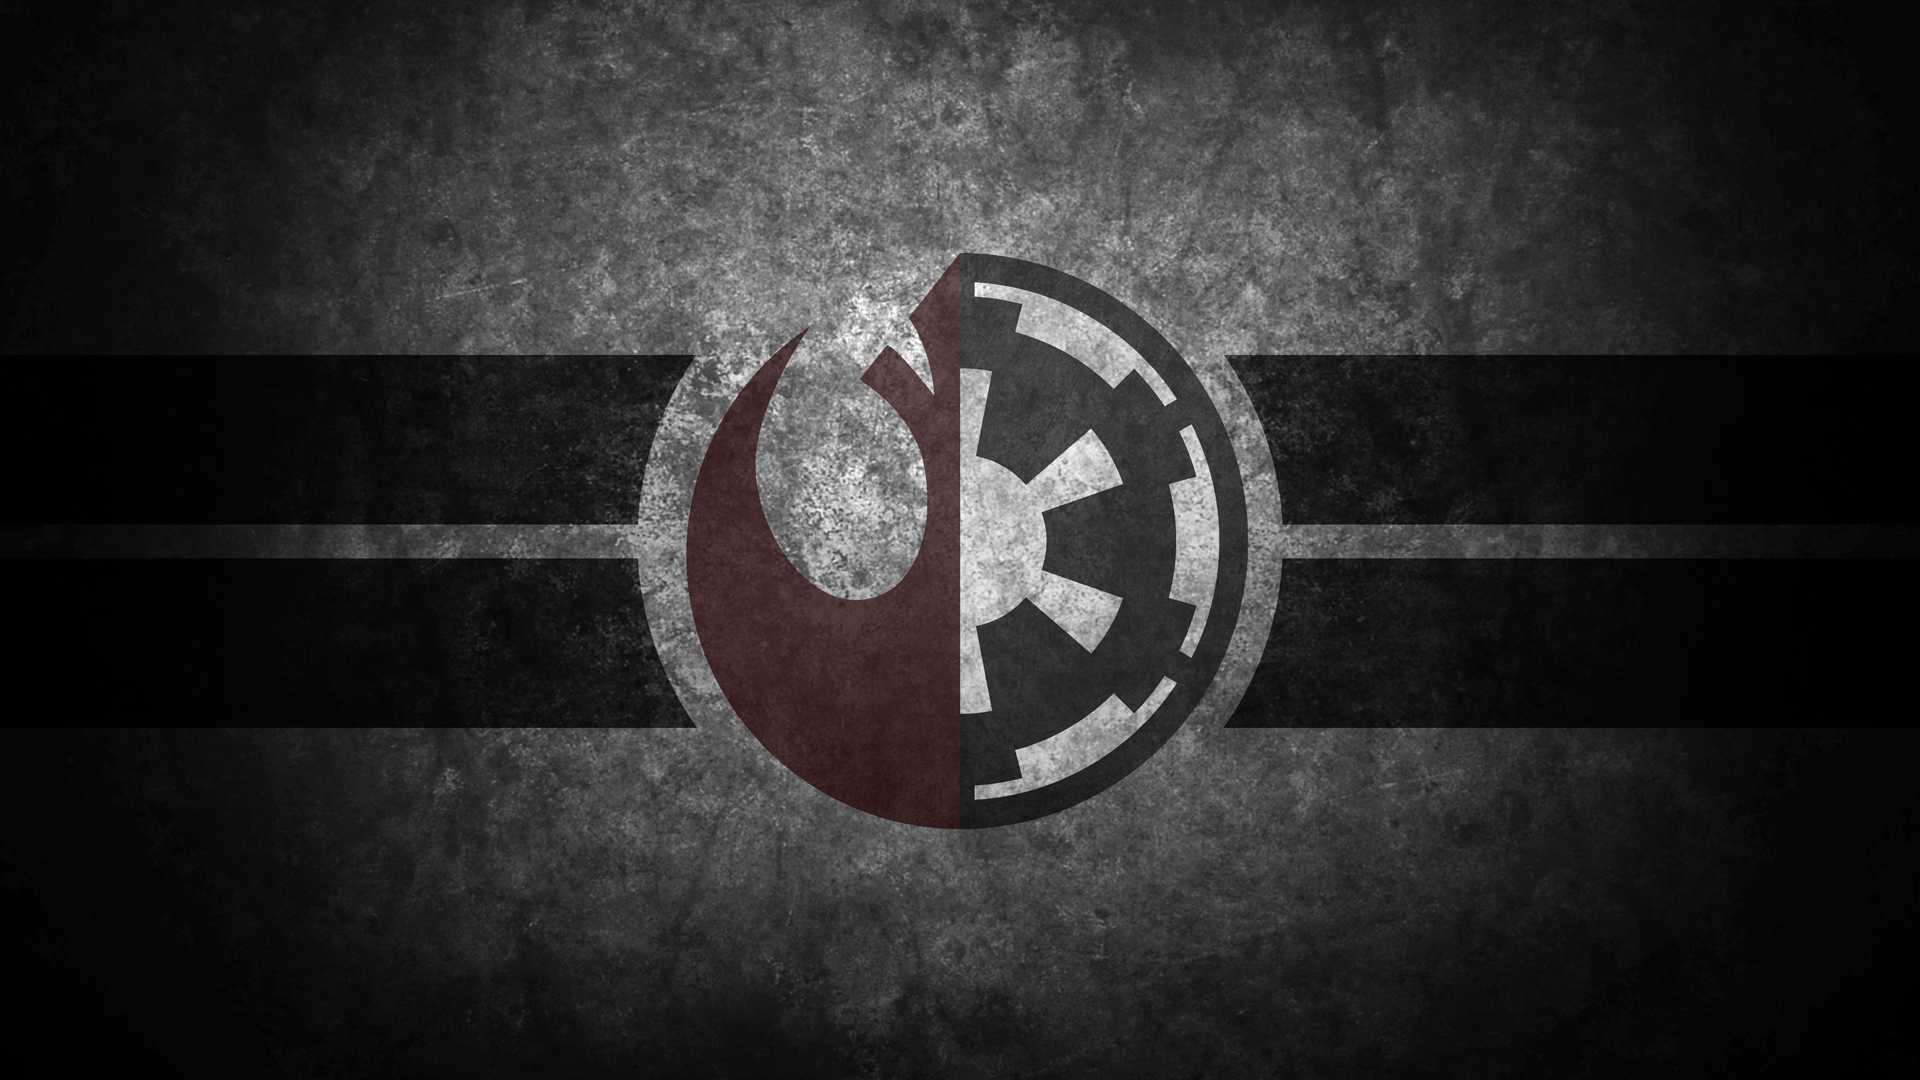 45 Star Wars Imperial Wallpaper Hd On Wallpapersafari